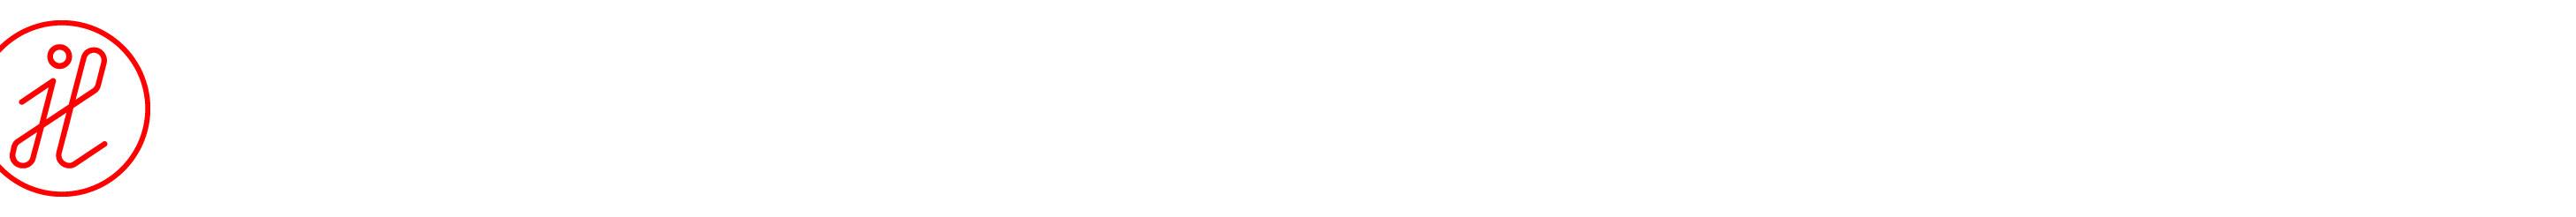 julien-lelievre-logo-index-grafik